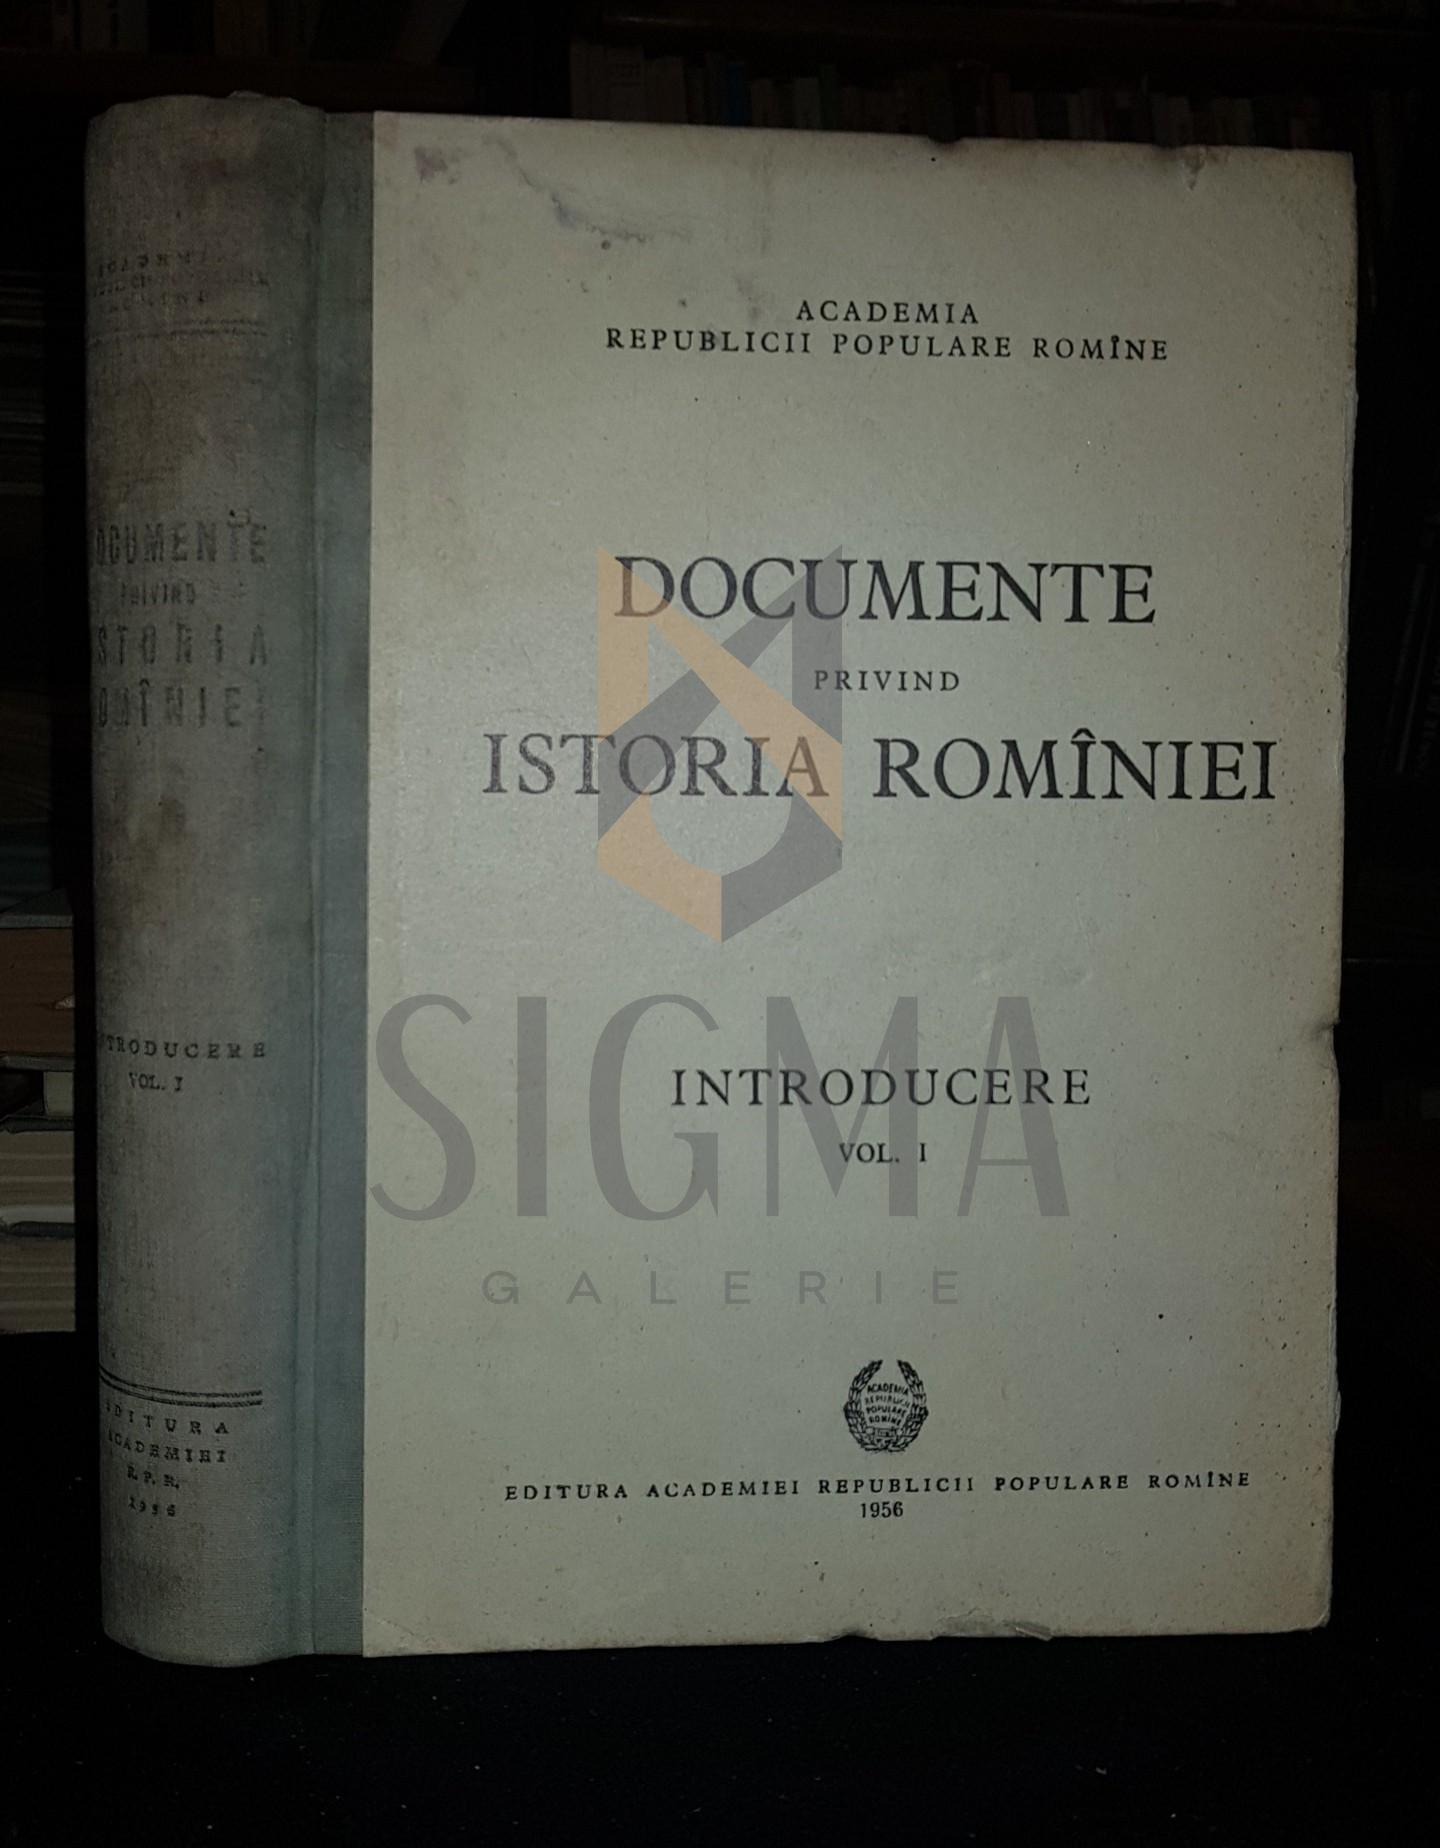 DAMIAN P. BOGDAN, EMIL VARTOSU, S. JAKO, ION IONASCU si FRANCISC PALL (Colectiv)